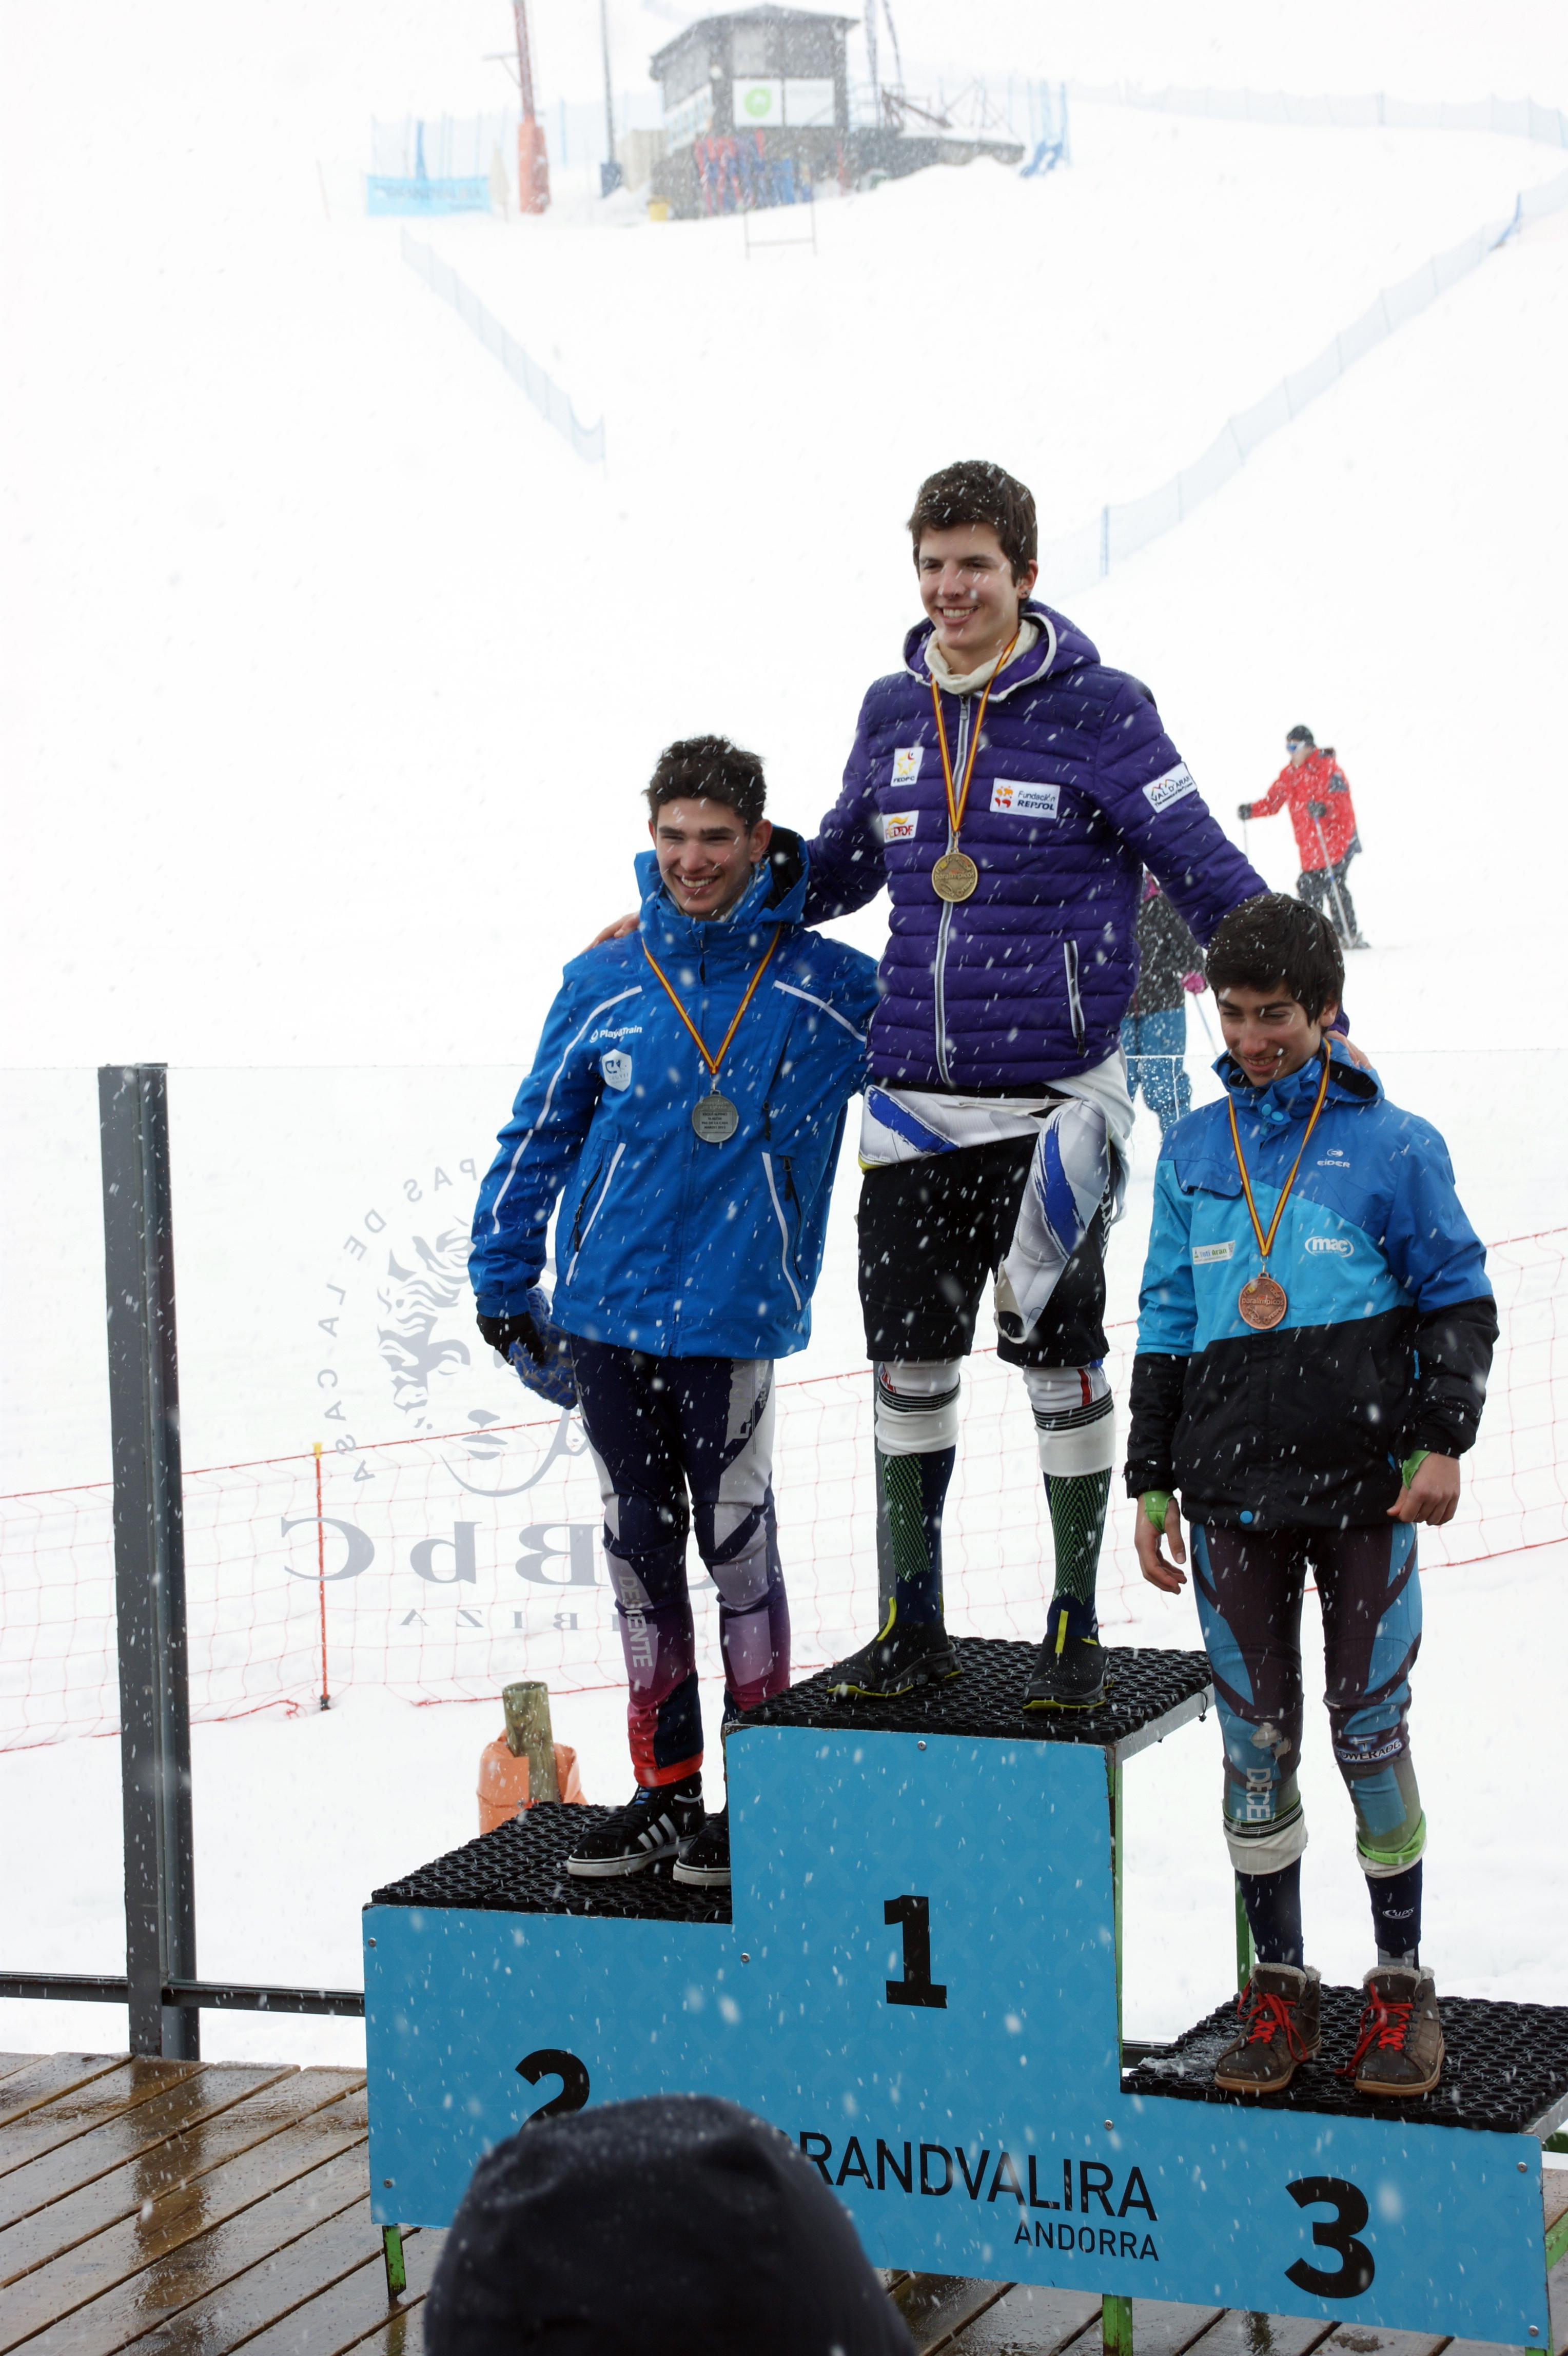 podio slalom, foto Julio FEDPC, oro Roger Puig, plata Pol Aguilar, bronce Jaime Almenar